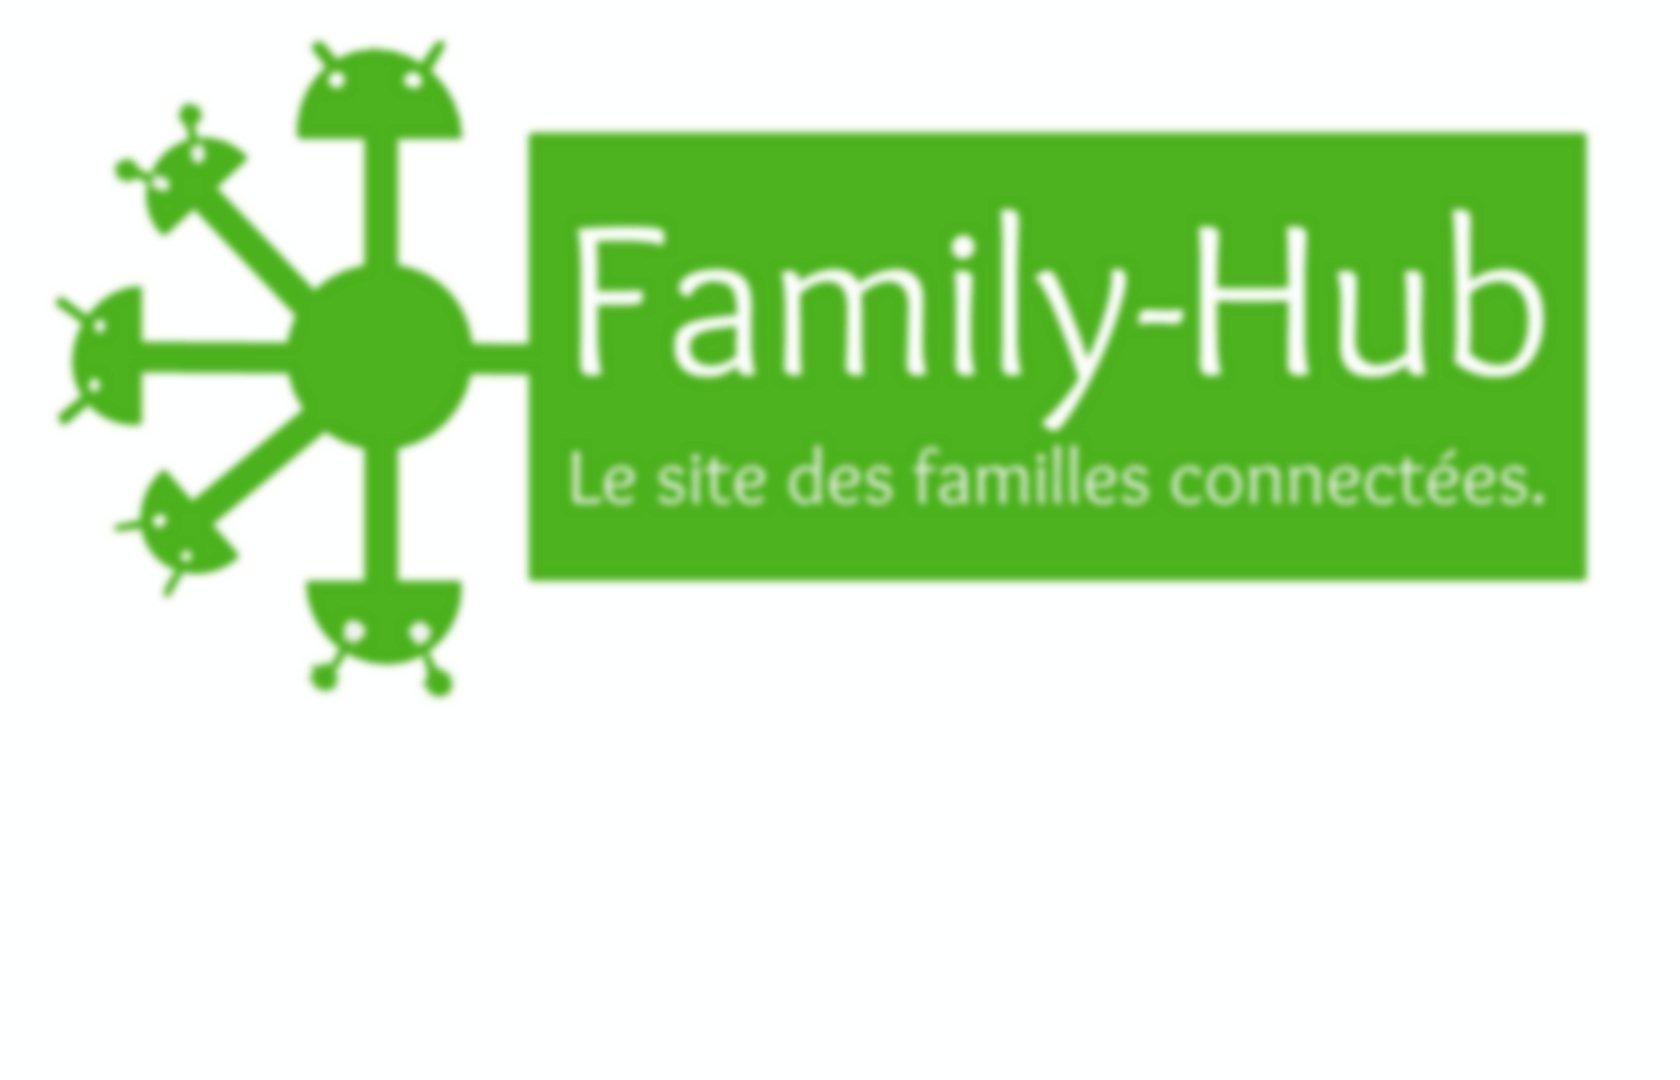 Family Meubles hubPearltrees Family Meubles Family hubPearltrees Meubles hubPearltrees nv8mOP0yNw